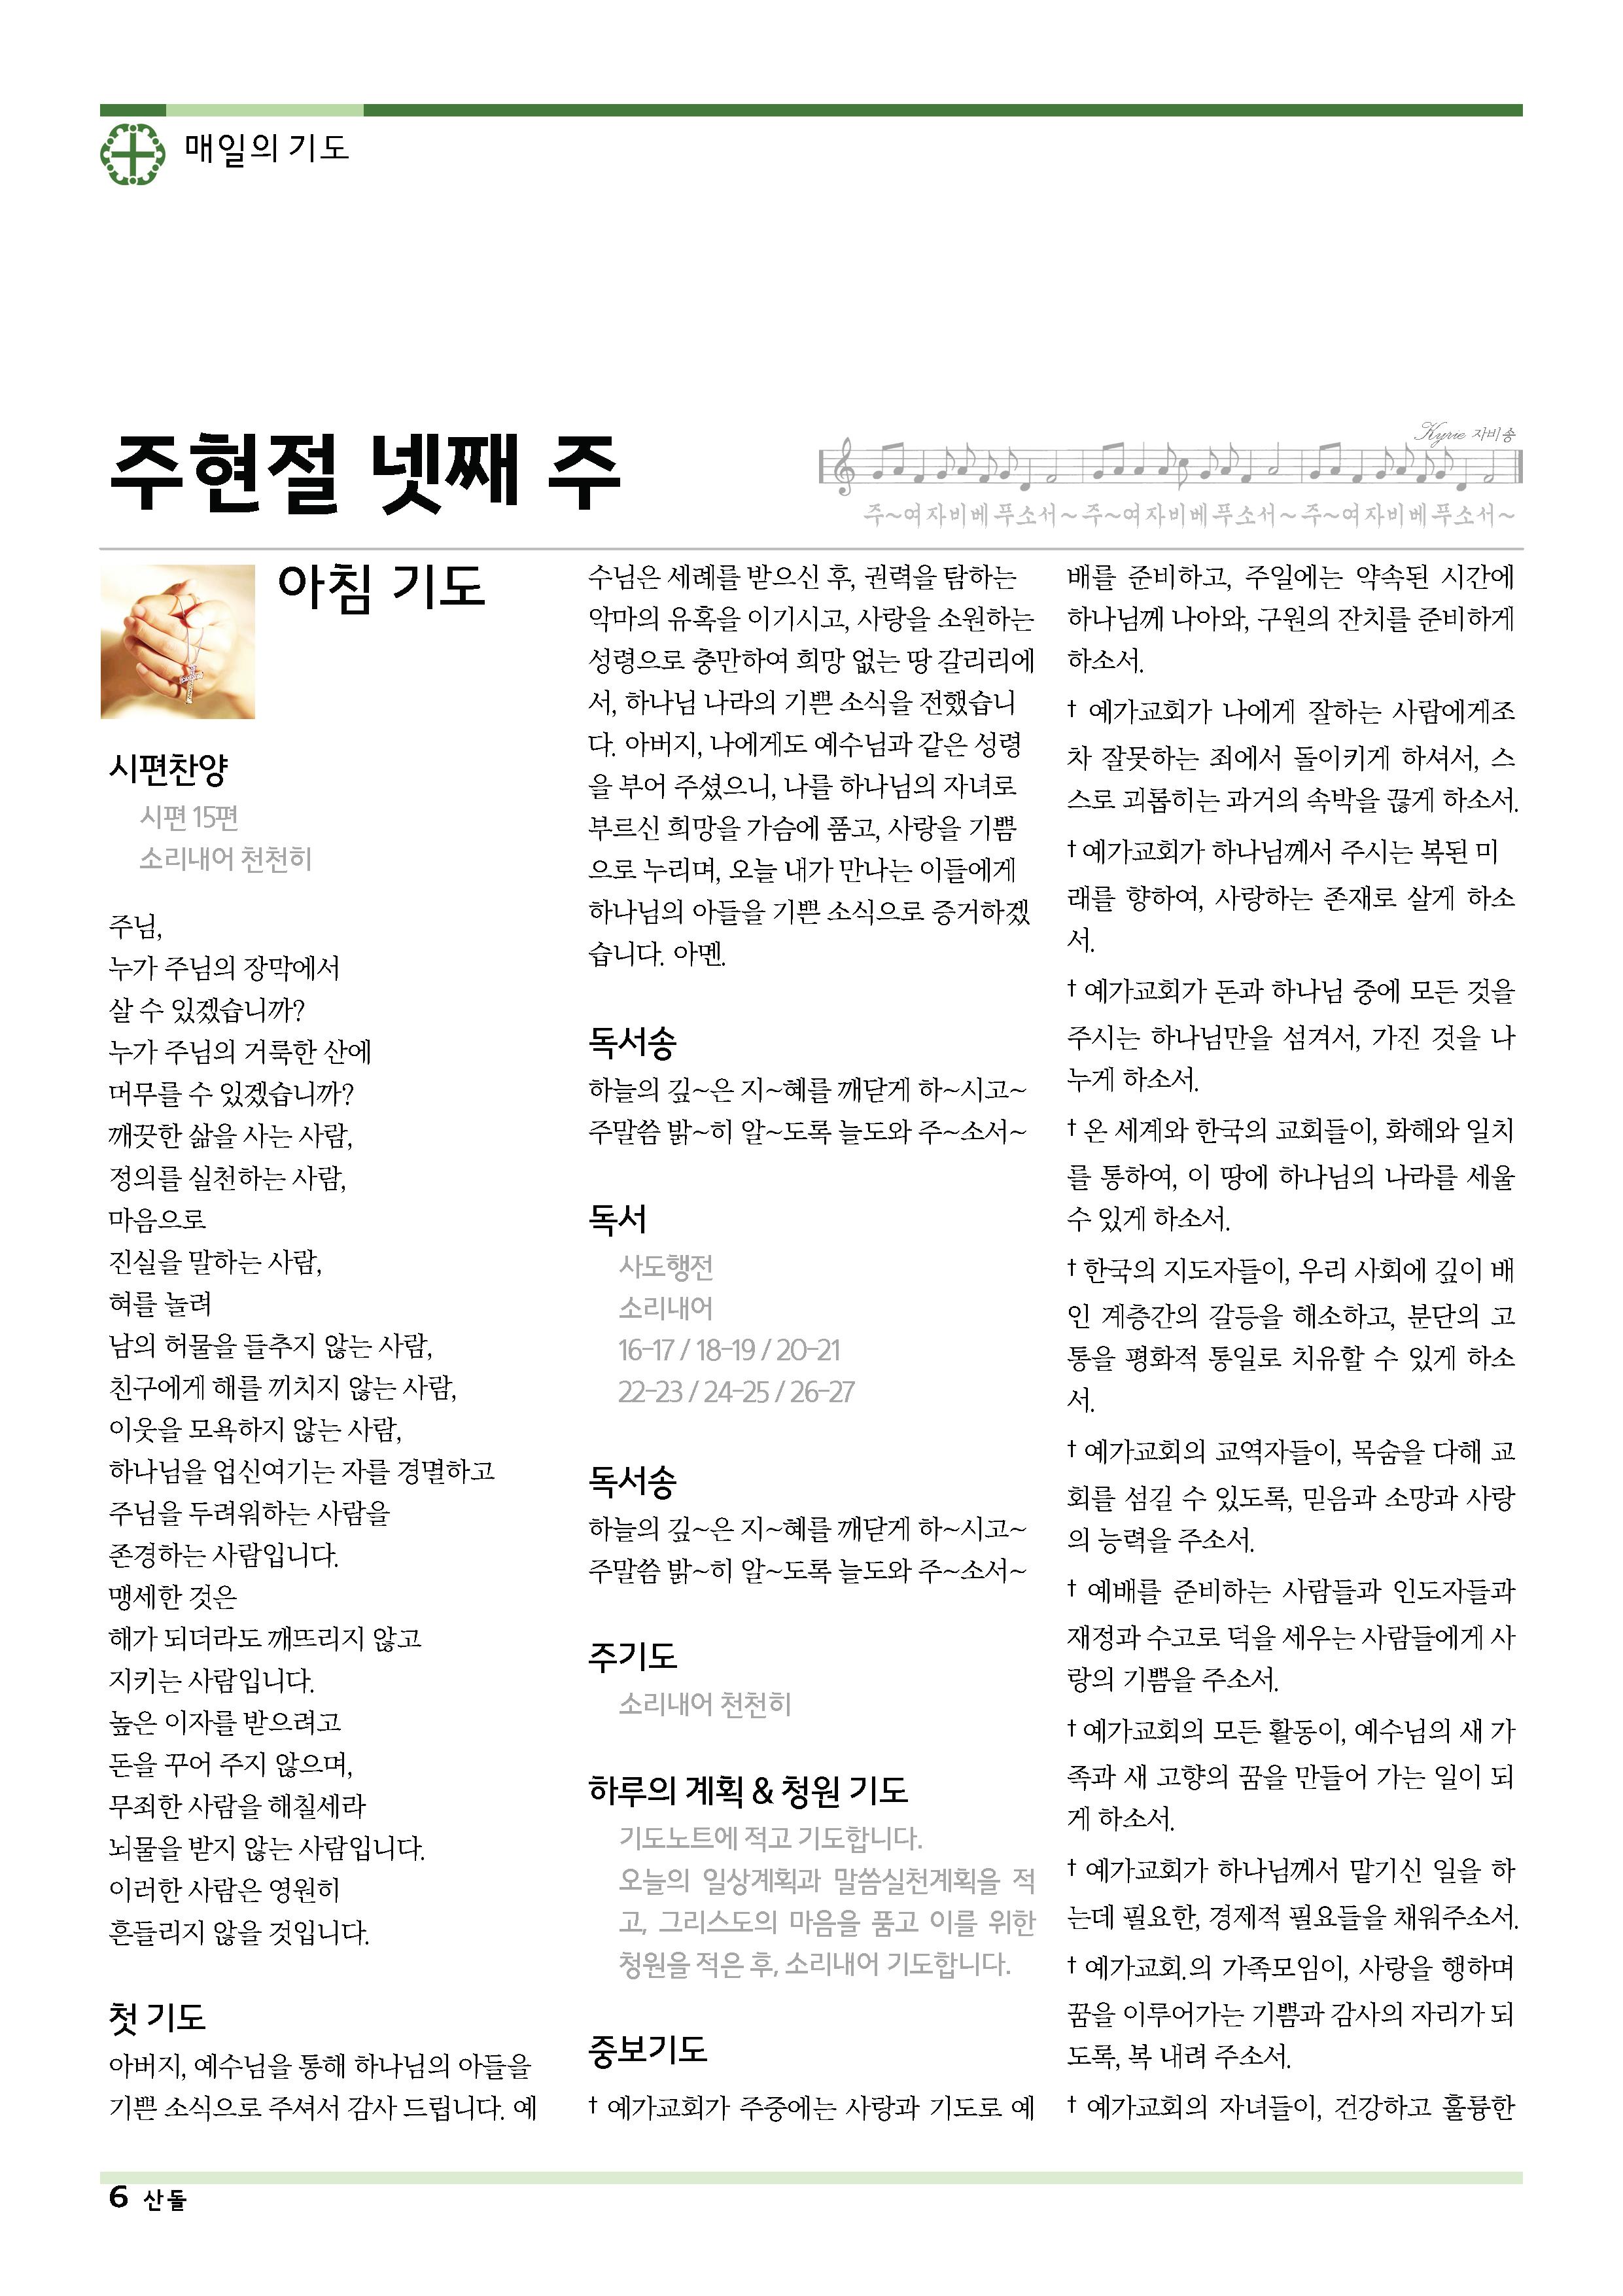 18sdjb0128_페이지_06.png